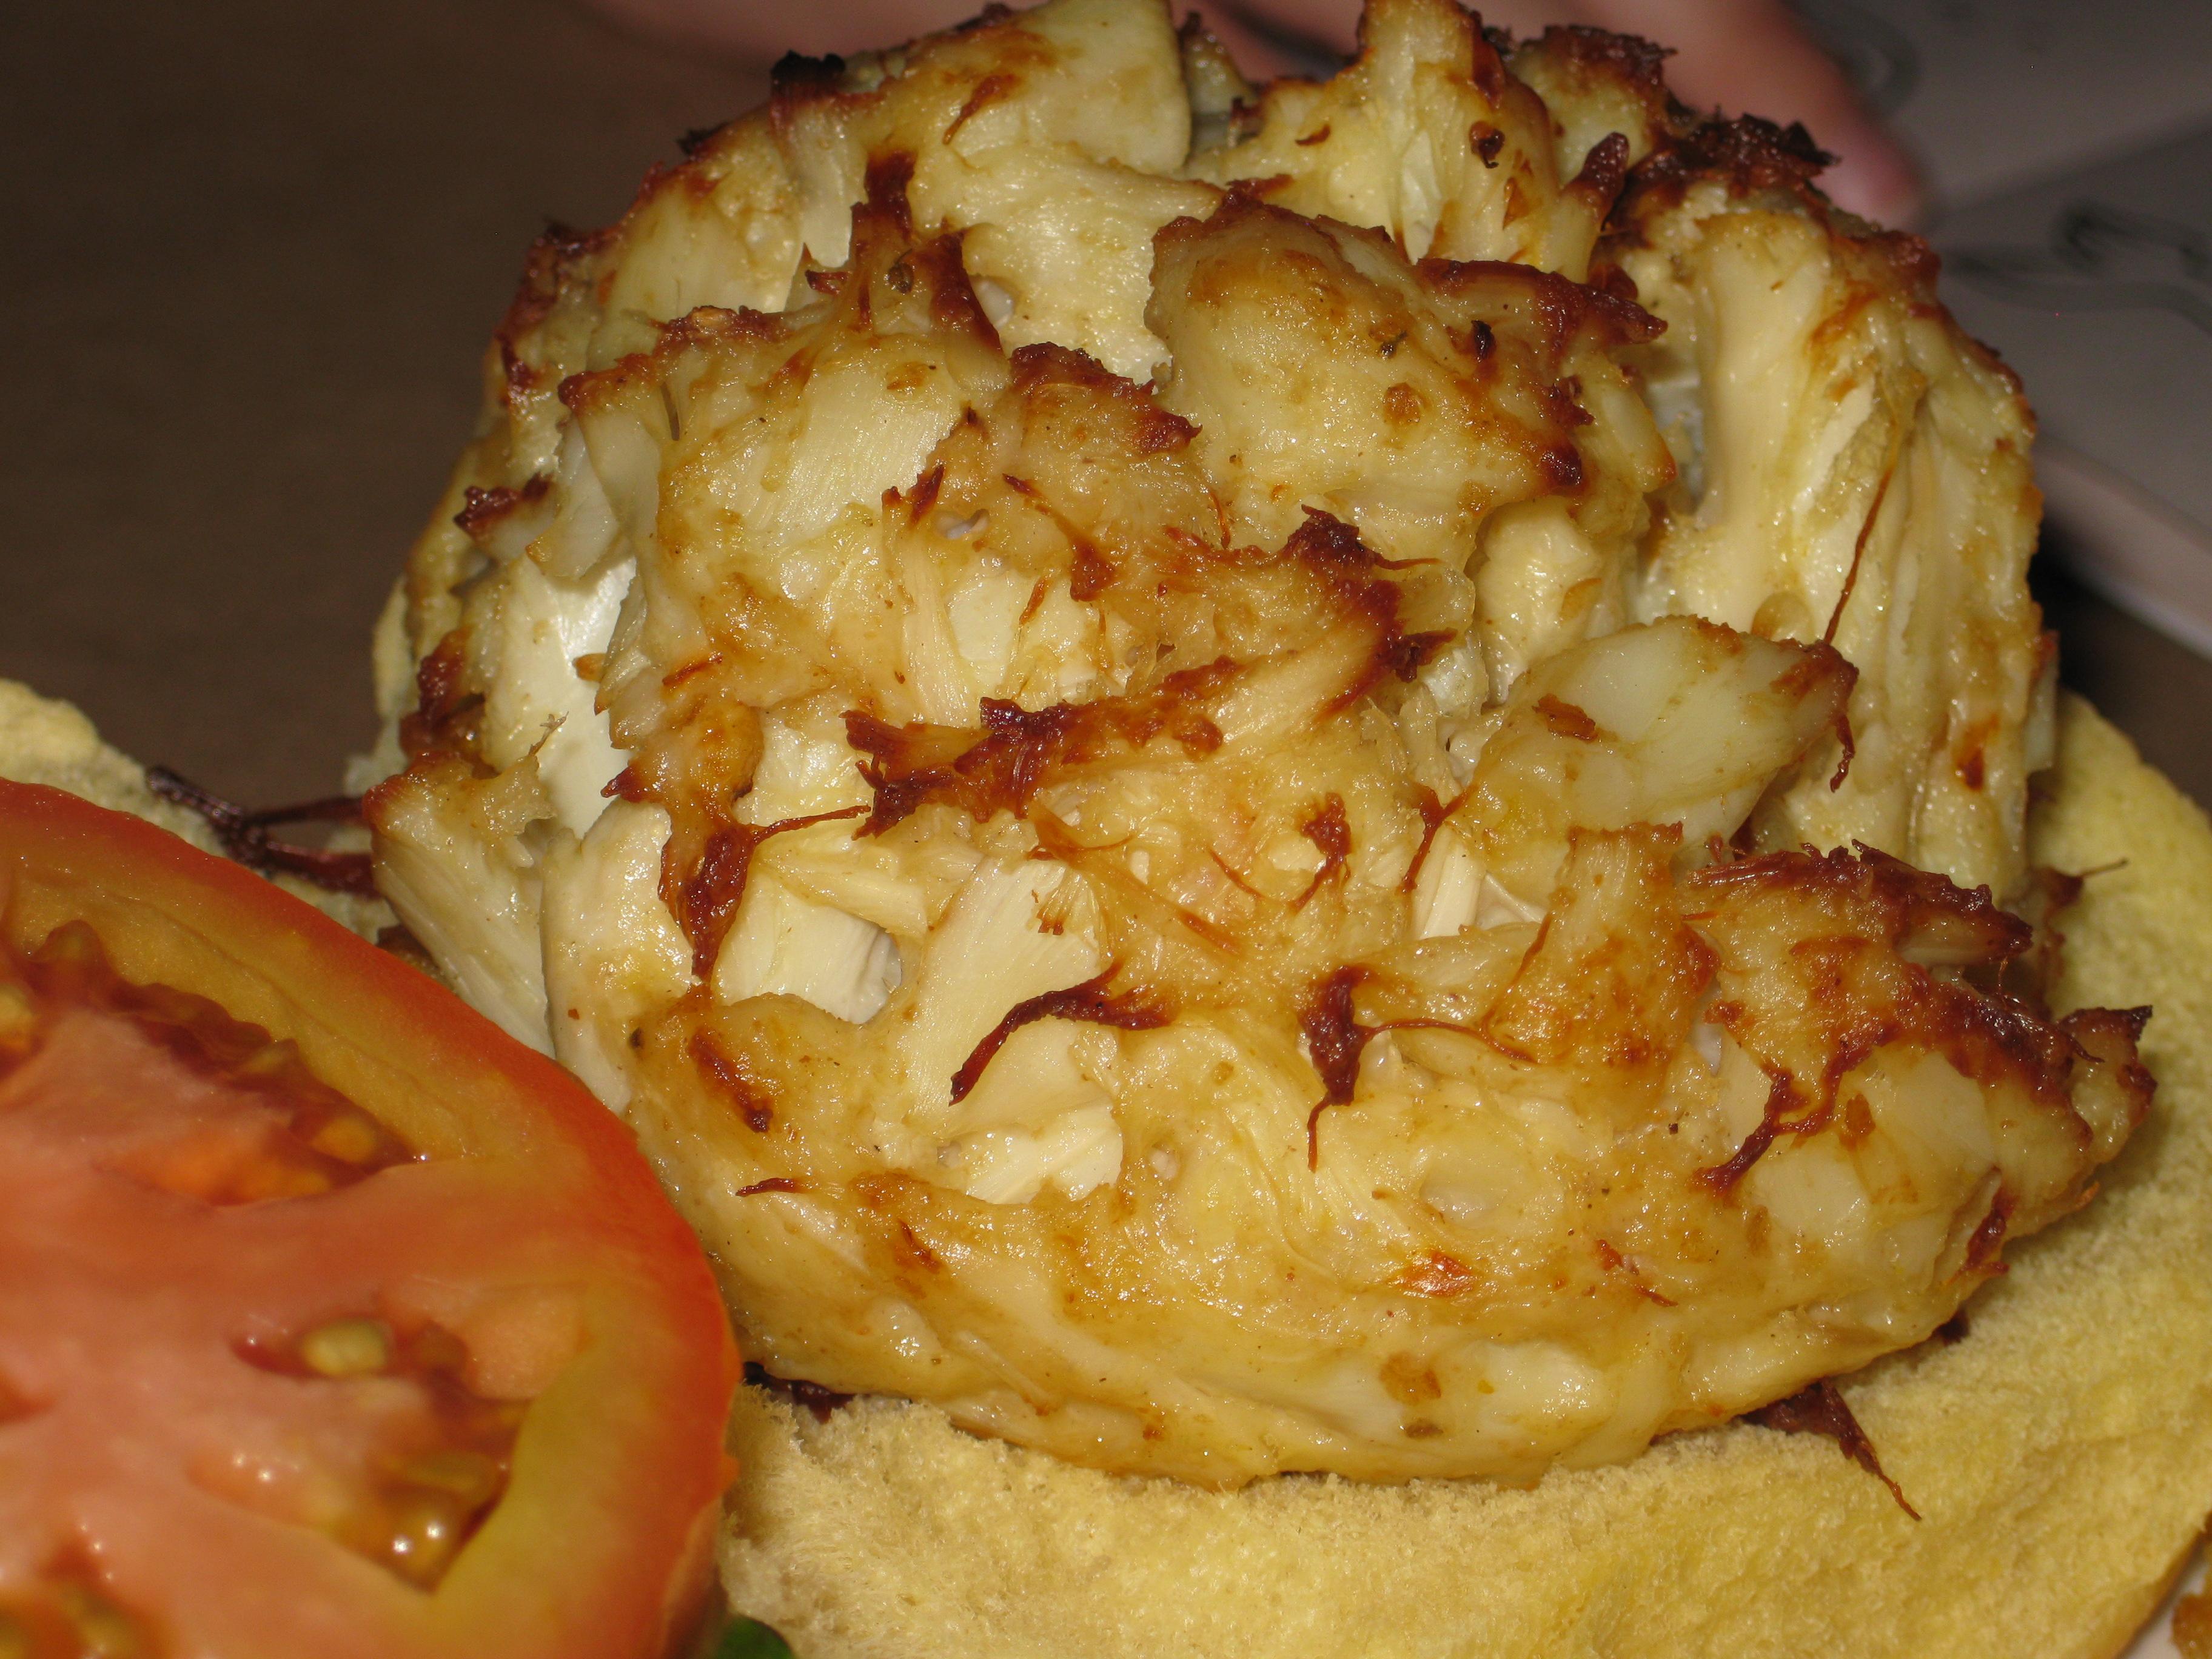 ... Crab Cake Dinner Stock Photo Image 9849640 Cake on Pinterest